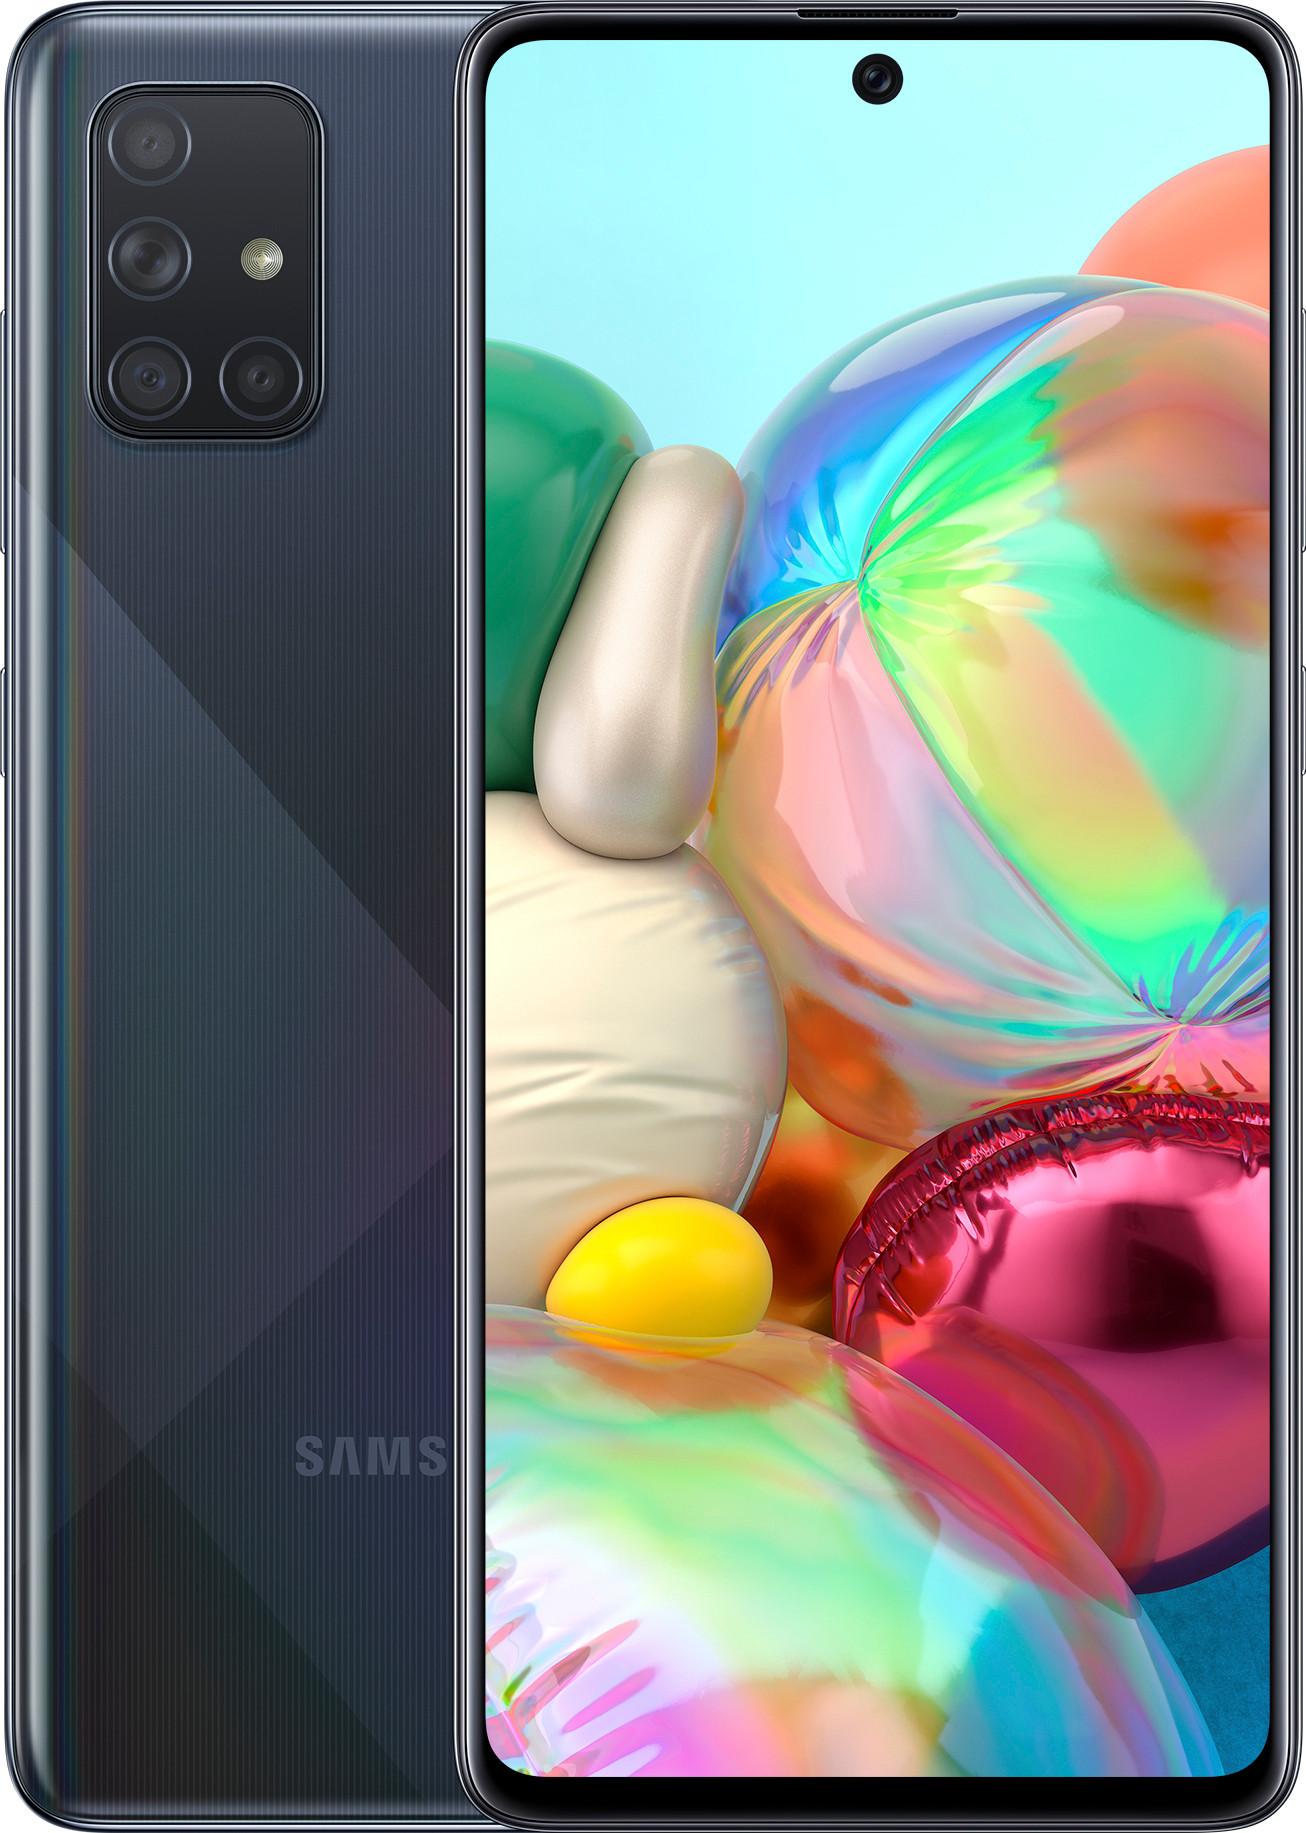 Reparatie Galaxy A71scherm reparatie